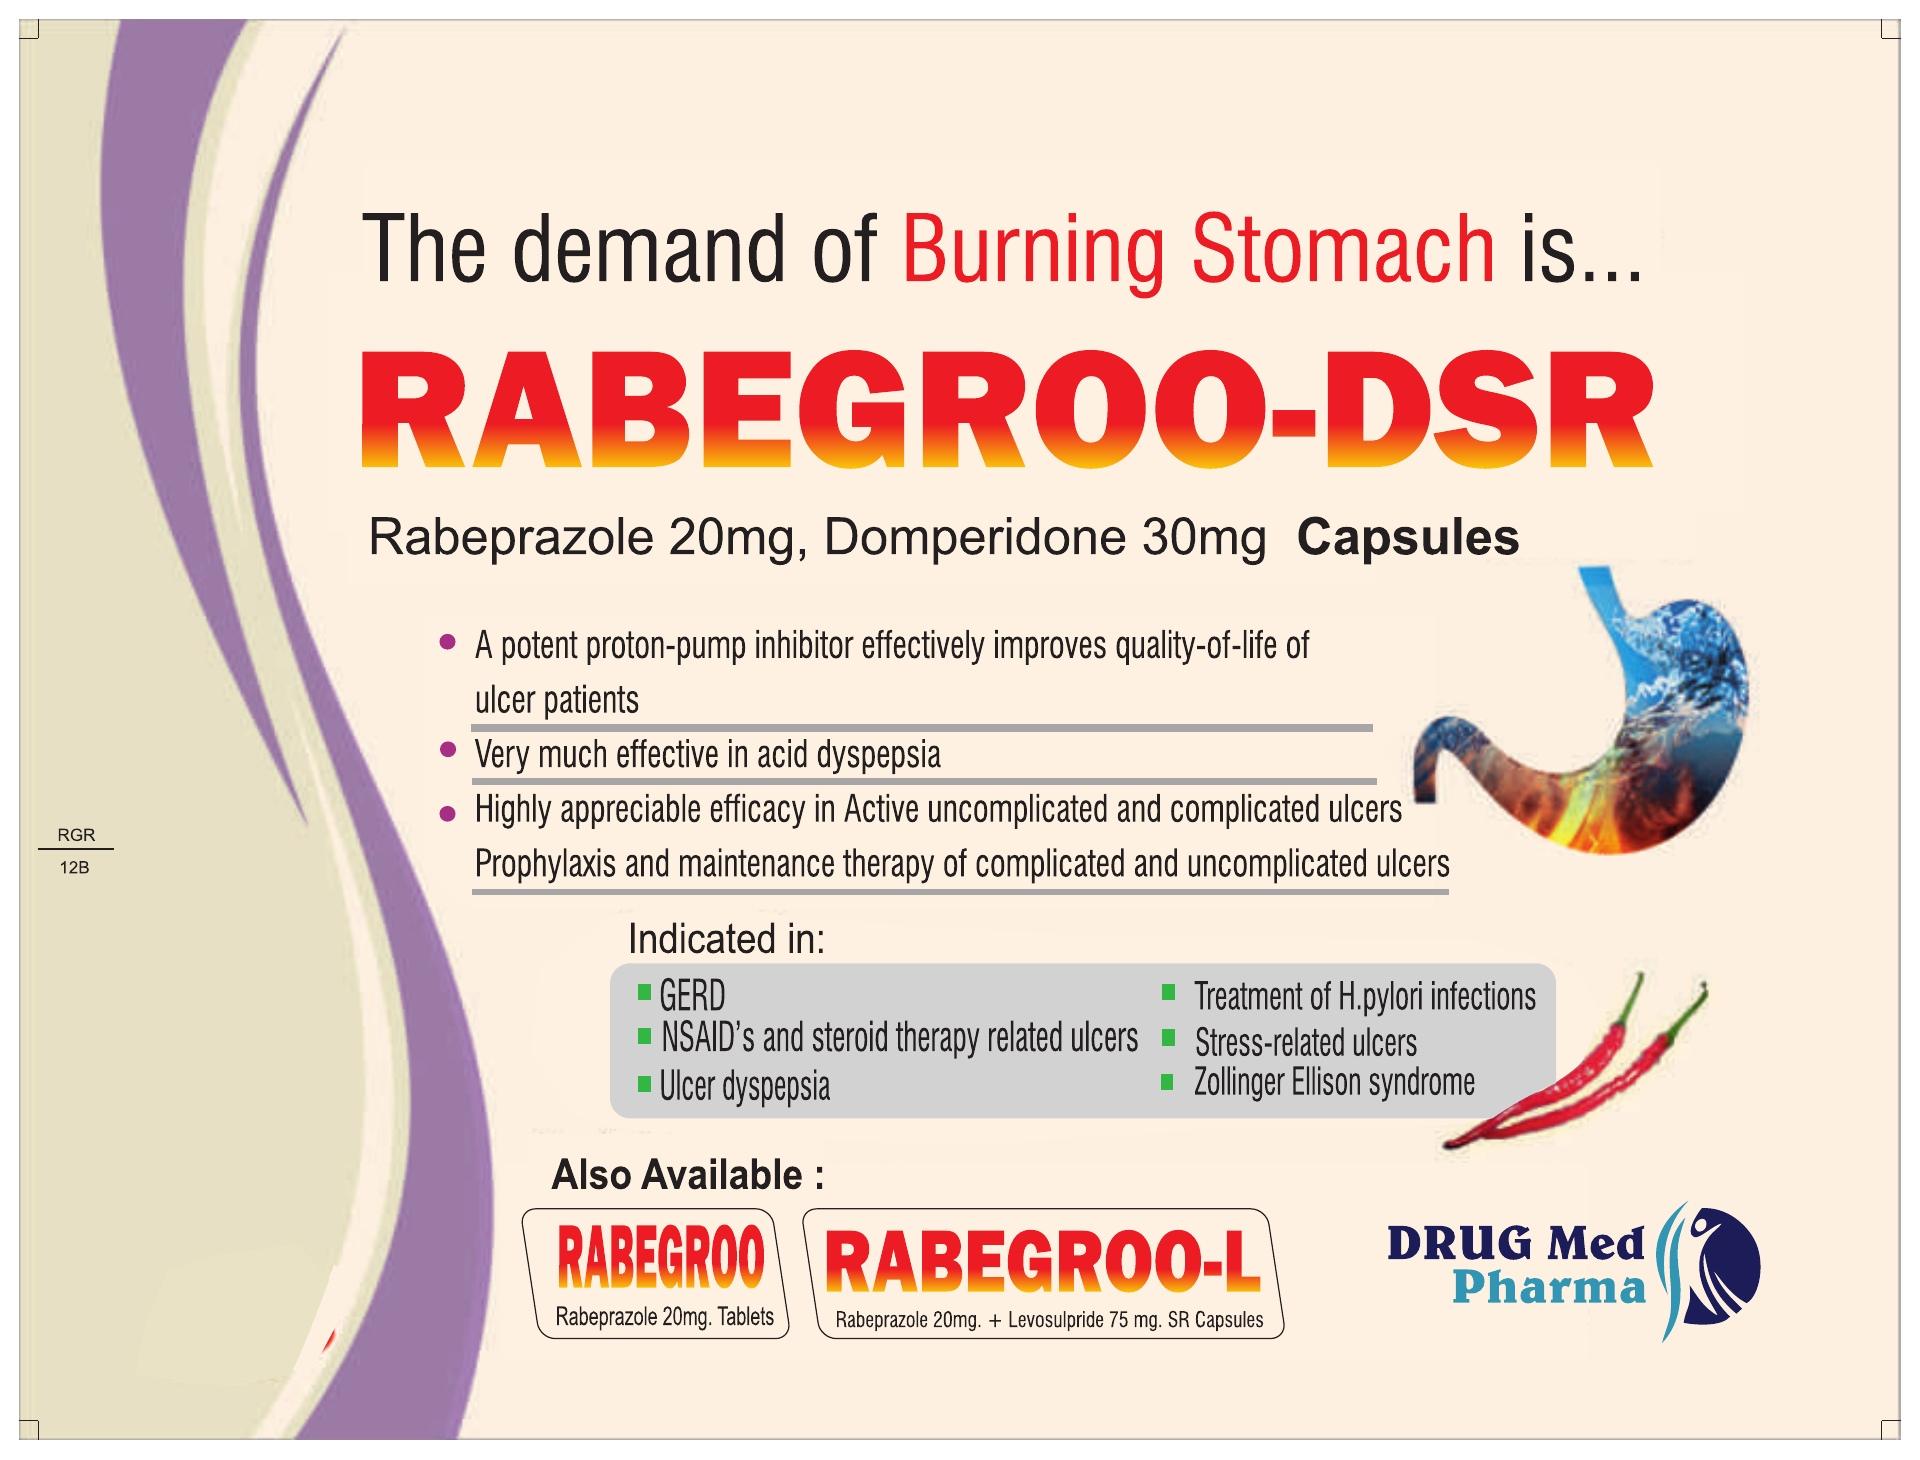 RABEGROO-DSR